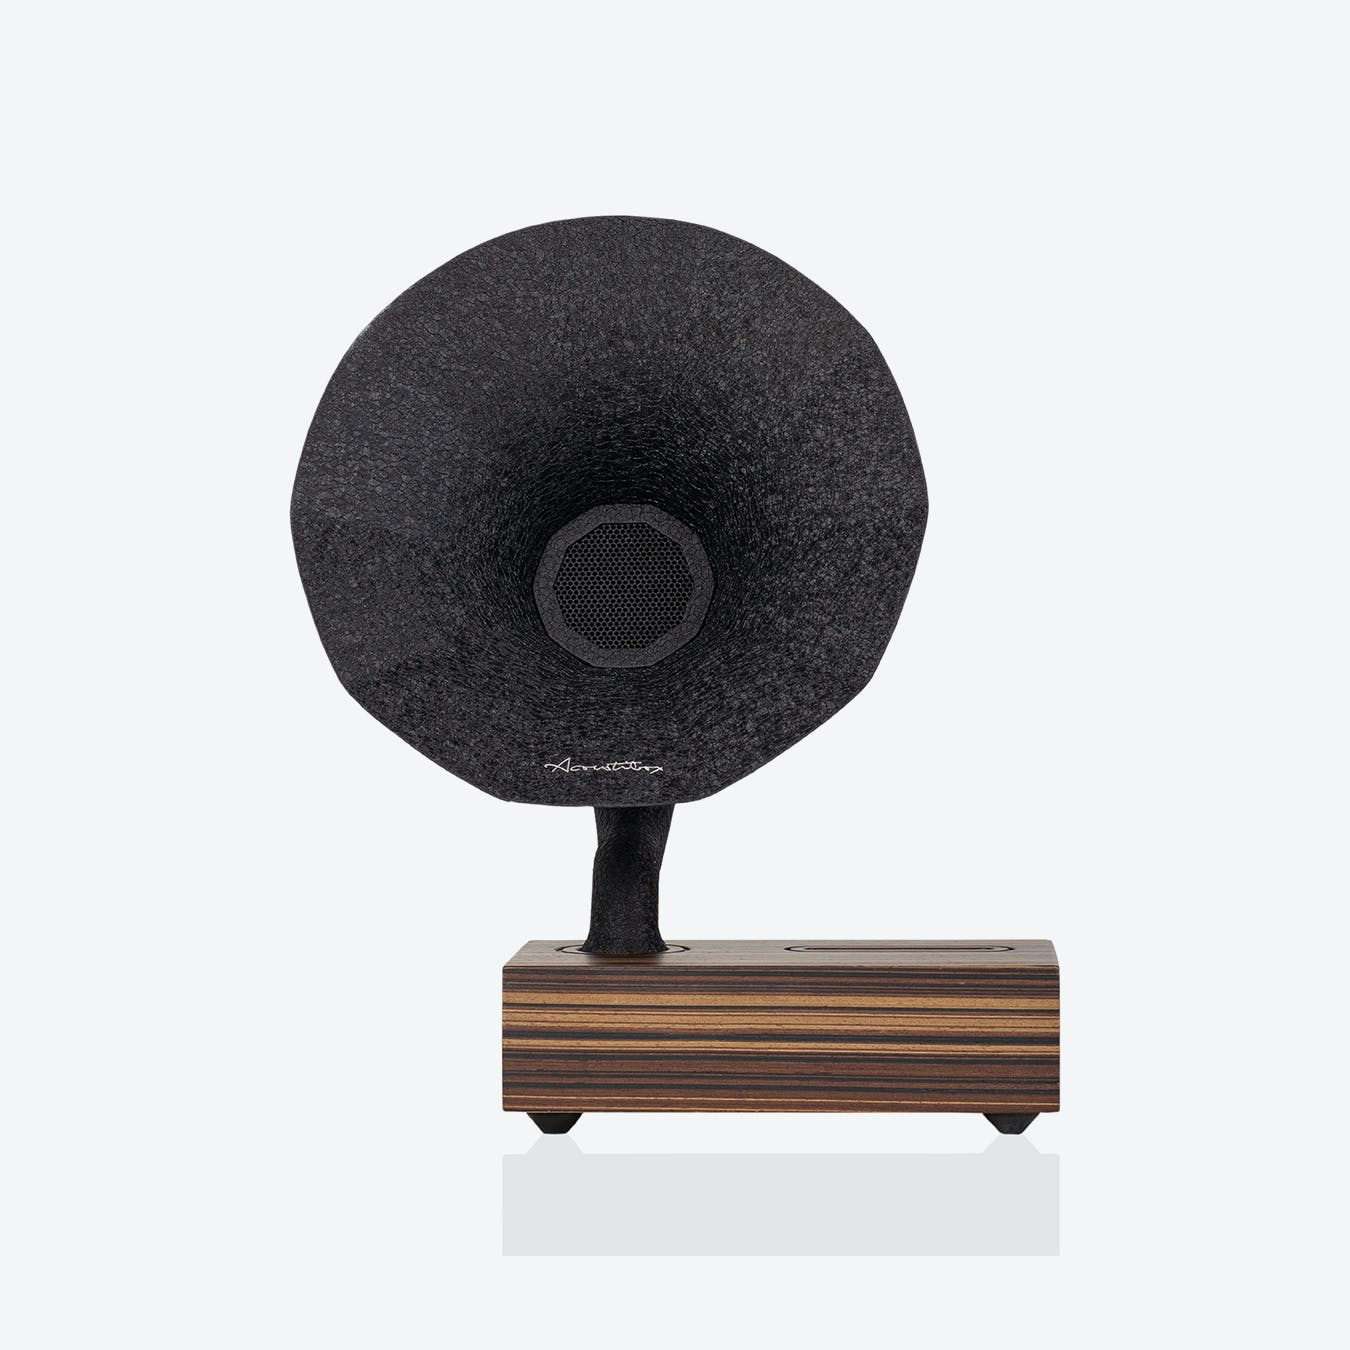 Gramophone Amplifier in Black/Light Wood